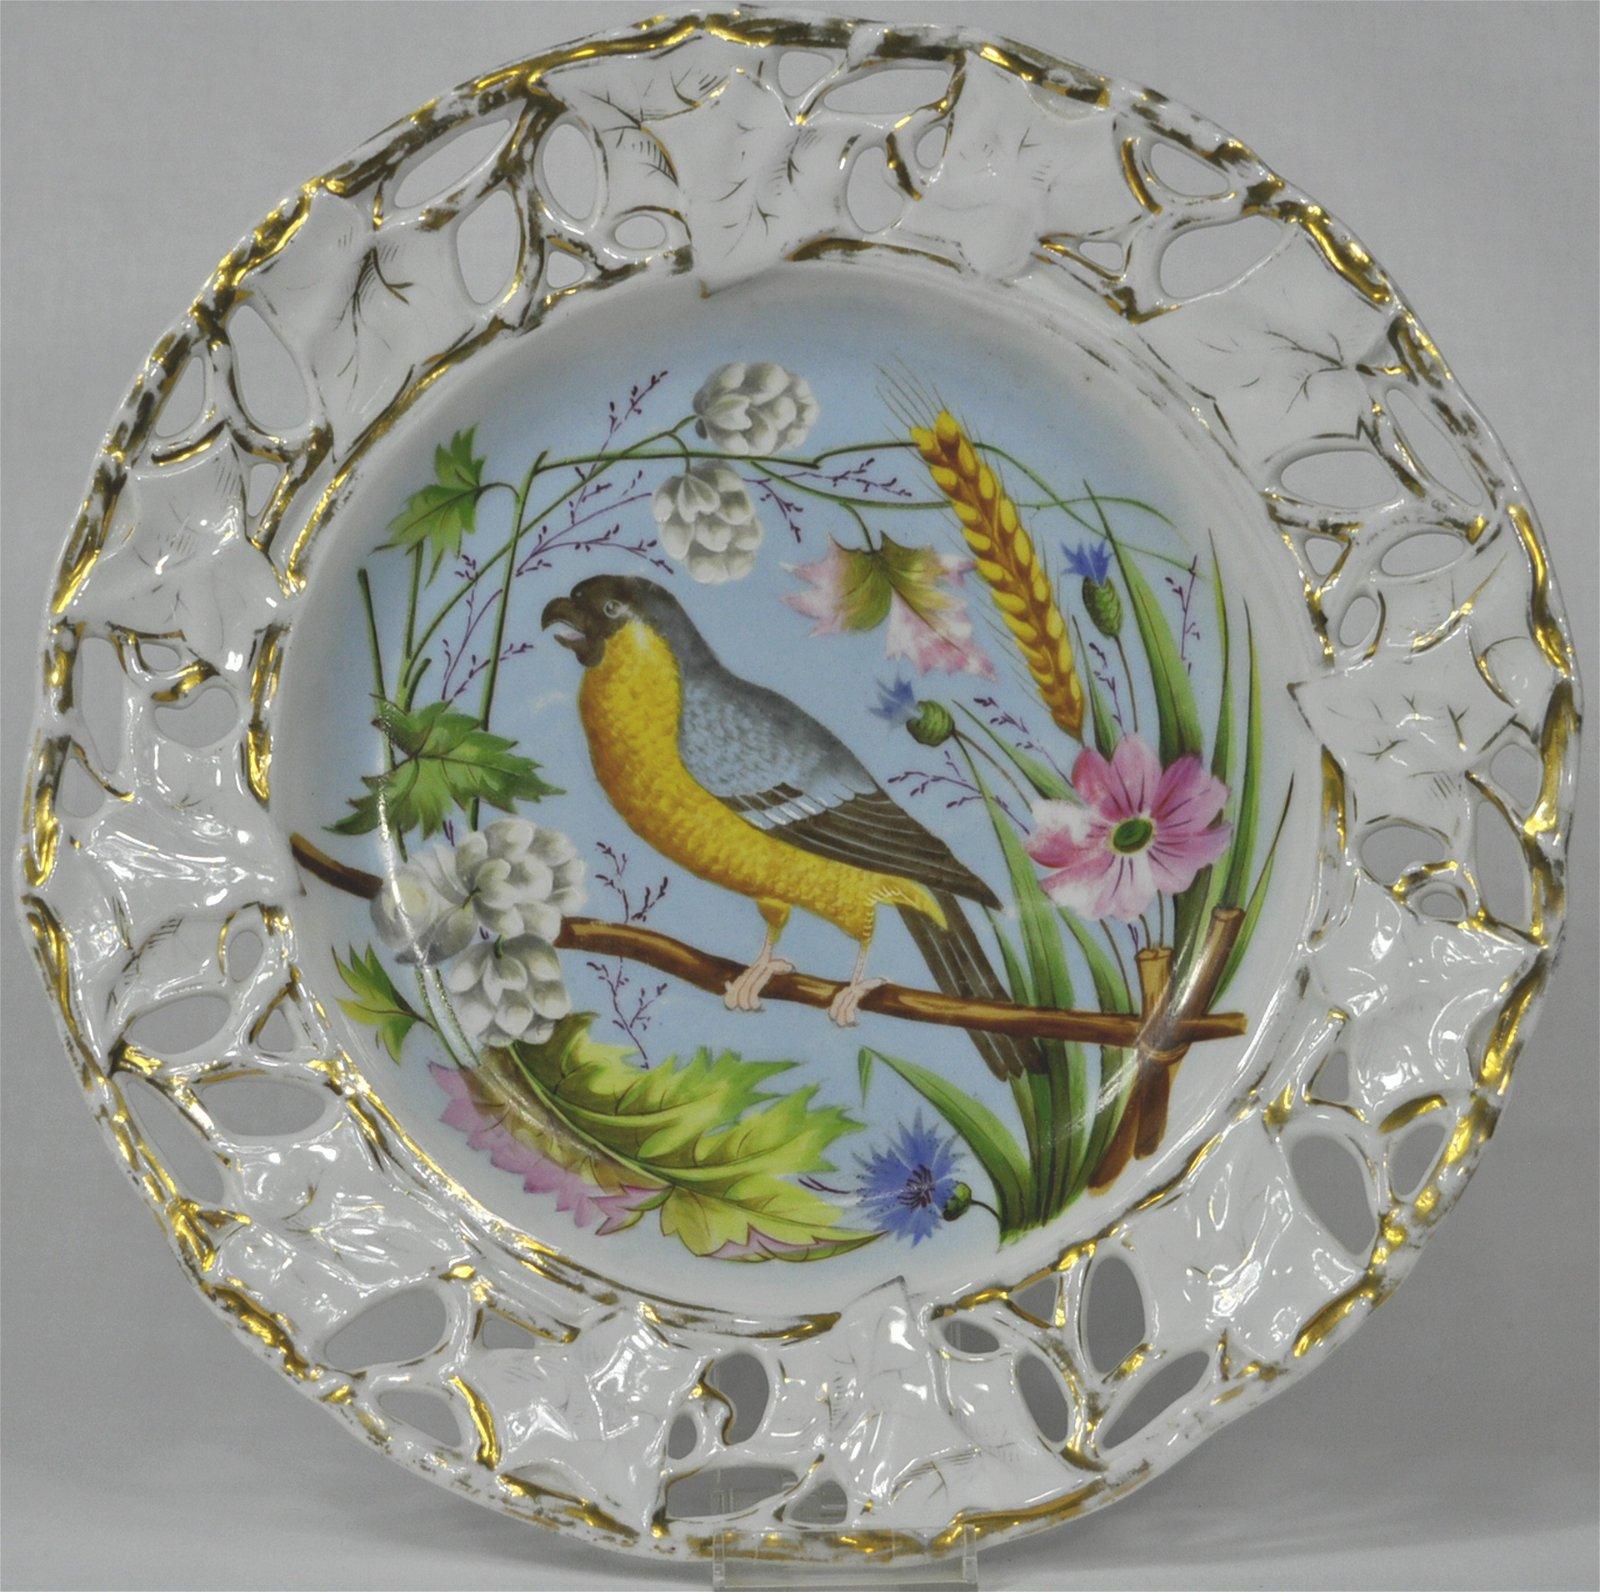 Bruder Schwalb Carlsbad Songbird Cabinet Plate